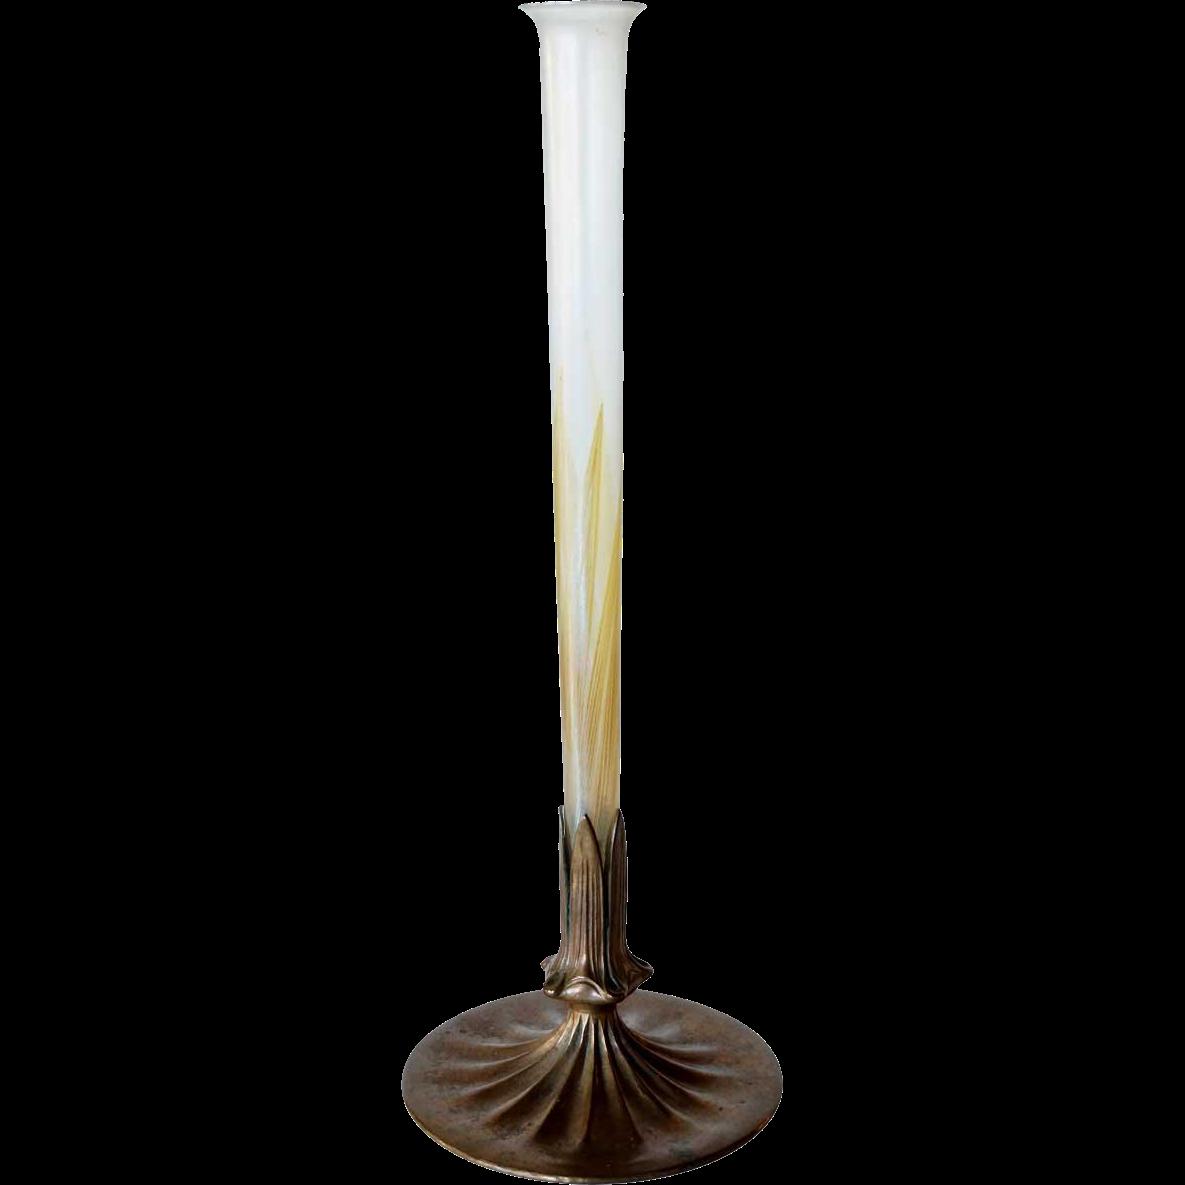 Scarce American Tiffany Studios Art Nouveau Glass Vase Insert